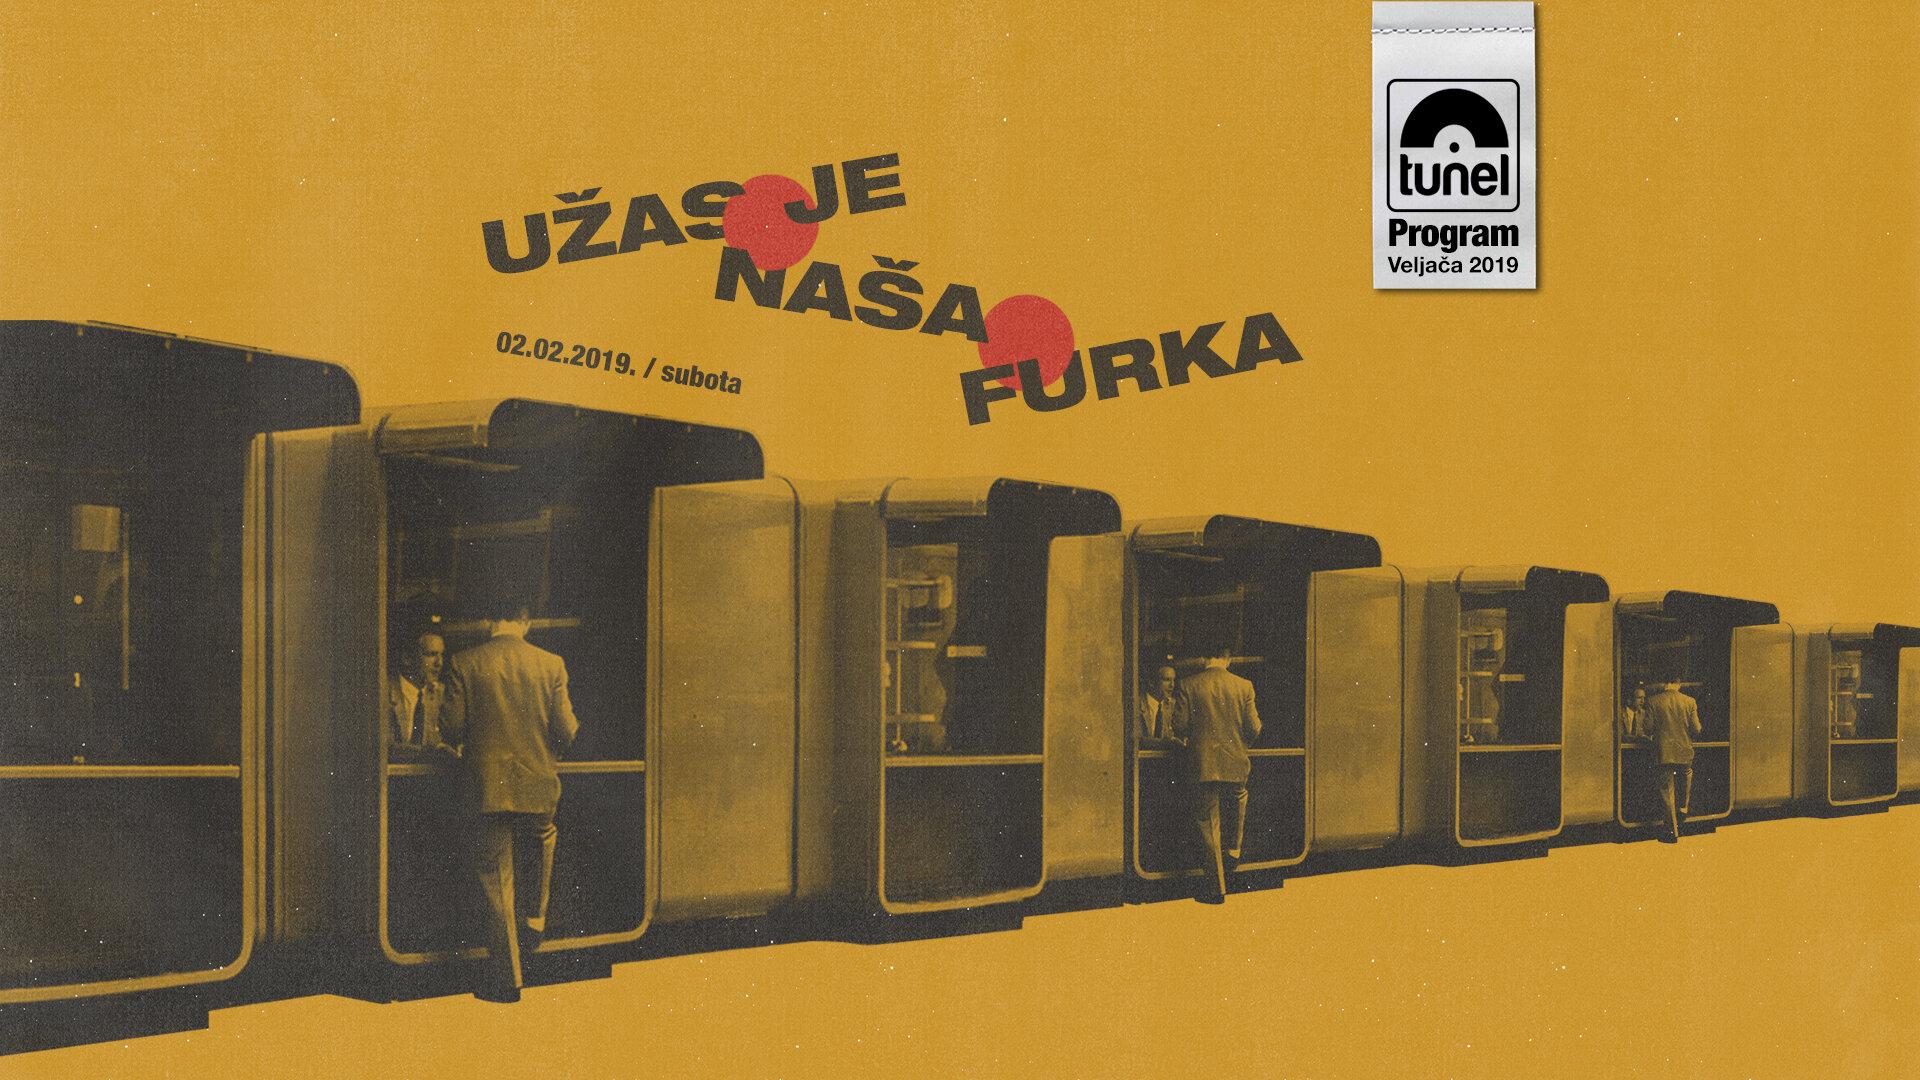 tunel-uzas-je-nasa-furka-02-02.jpg